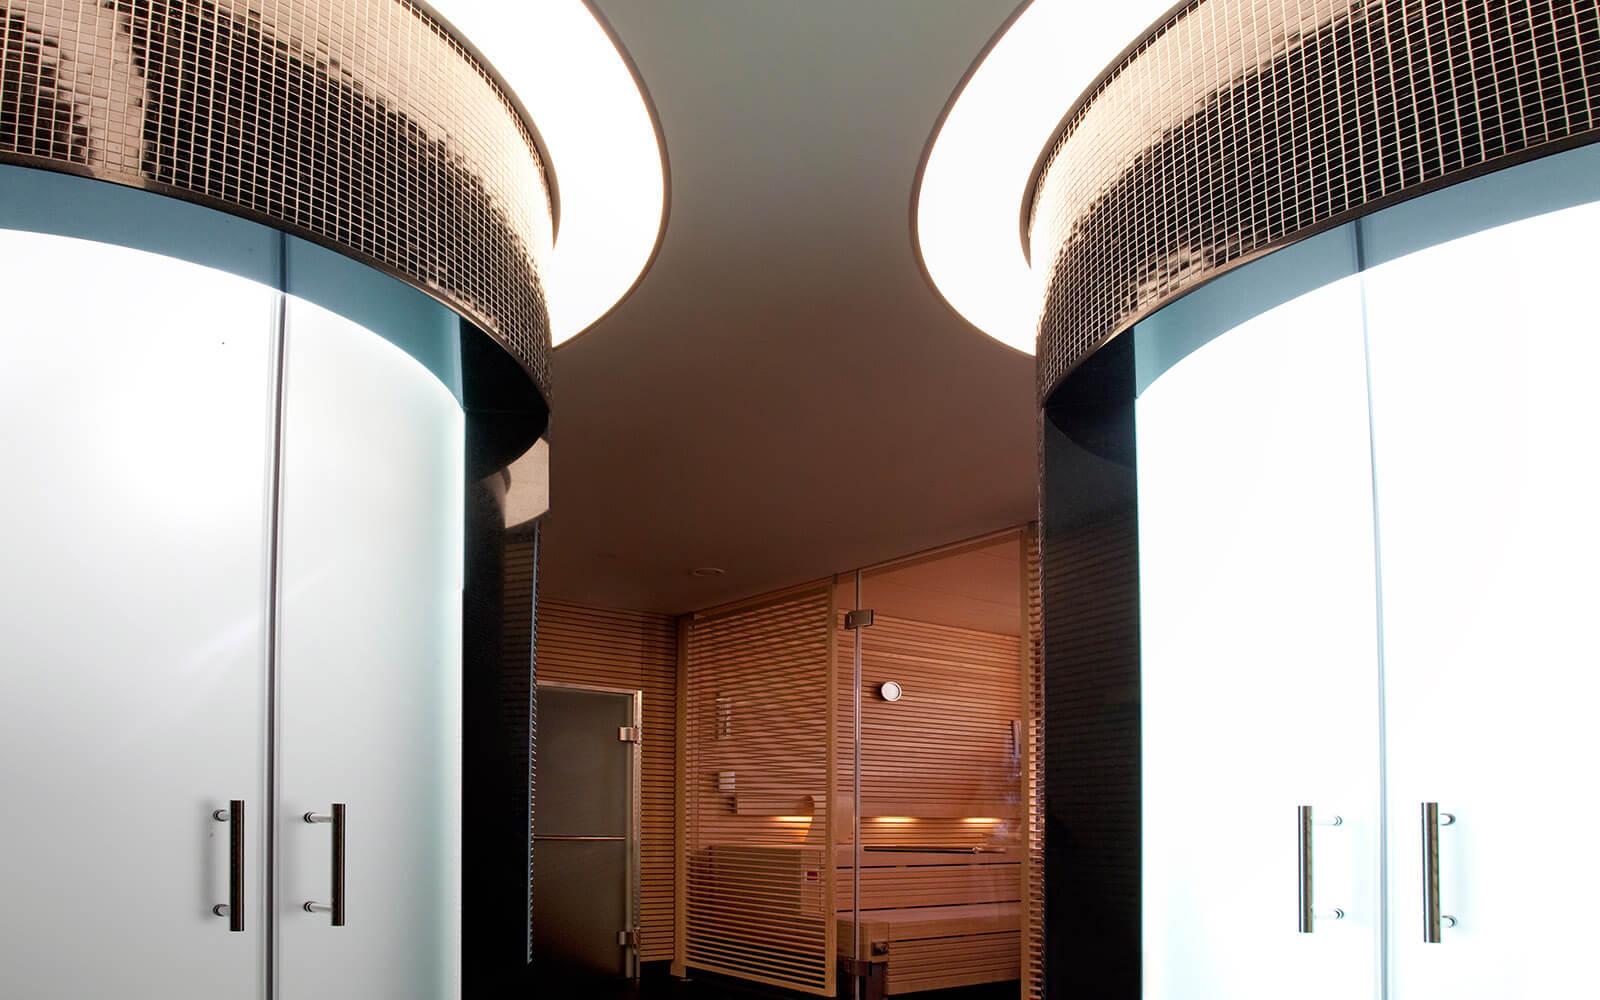 Premium KLAFS Sauna and Wellness Area in Germany